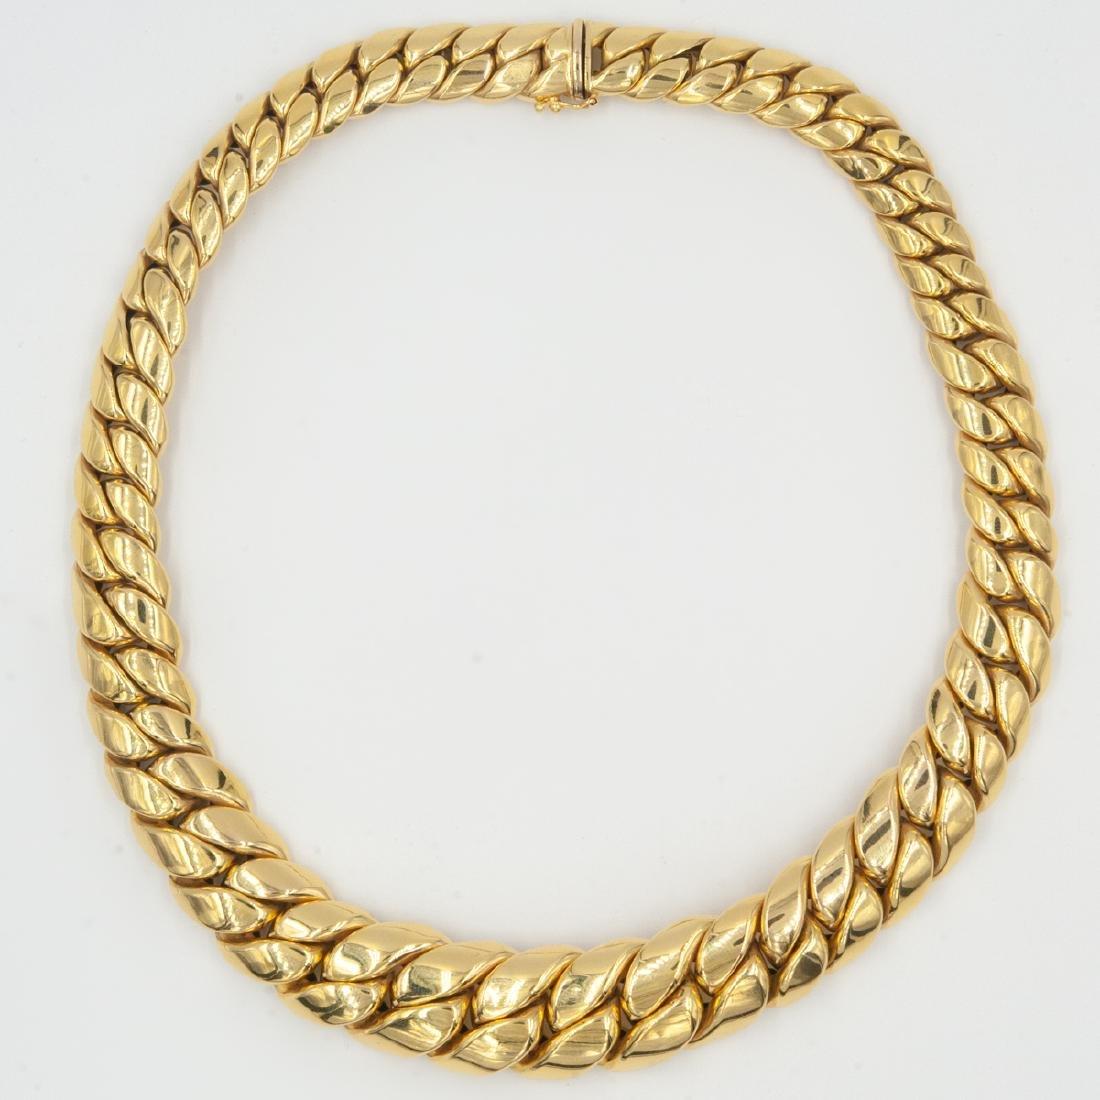 14K Gold Cuban Link Necklace